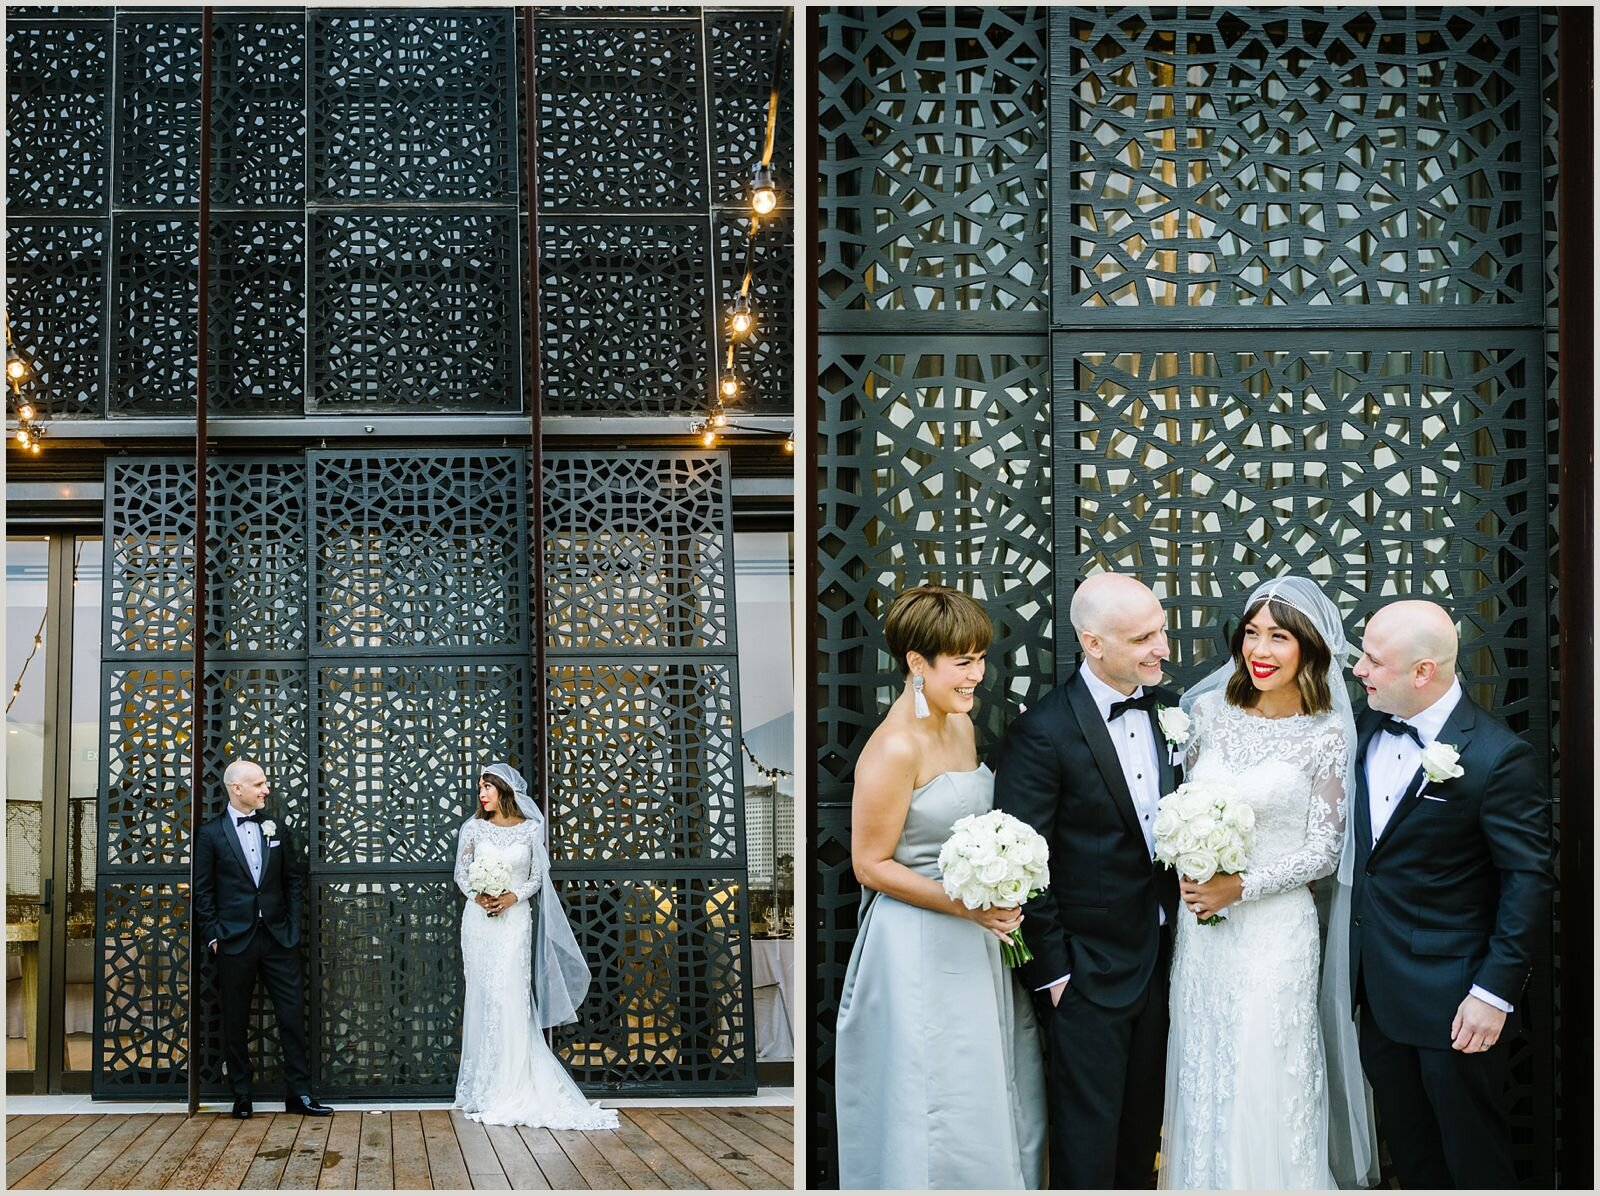 joseph_koprek_wedding_melbourne_the_prince_deck_0043.jpg